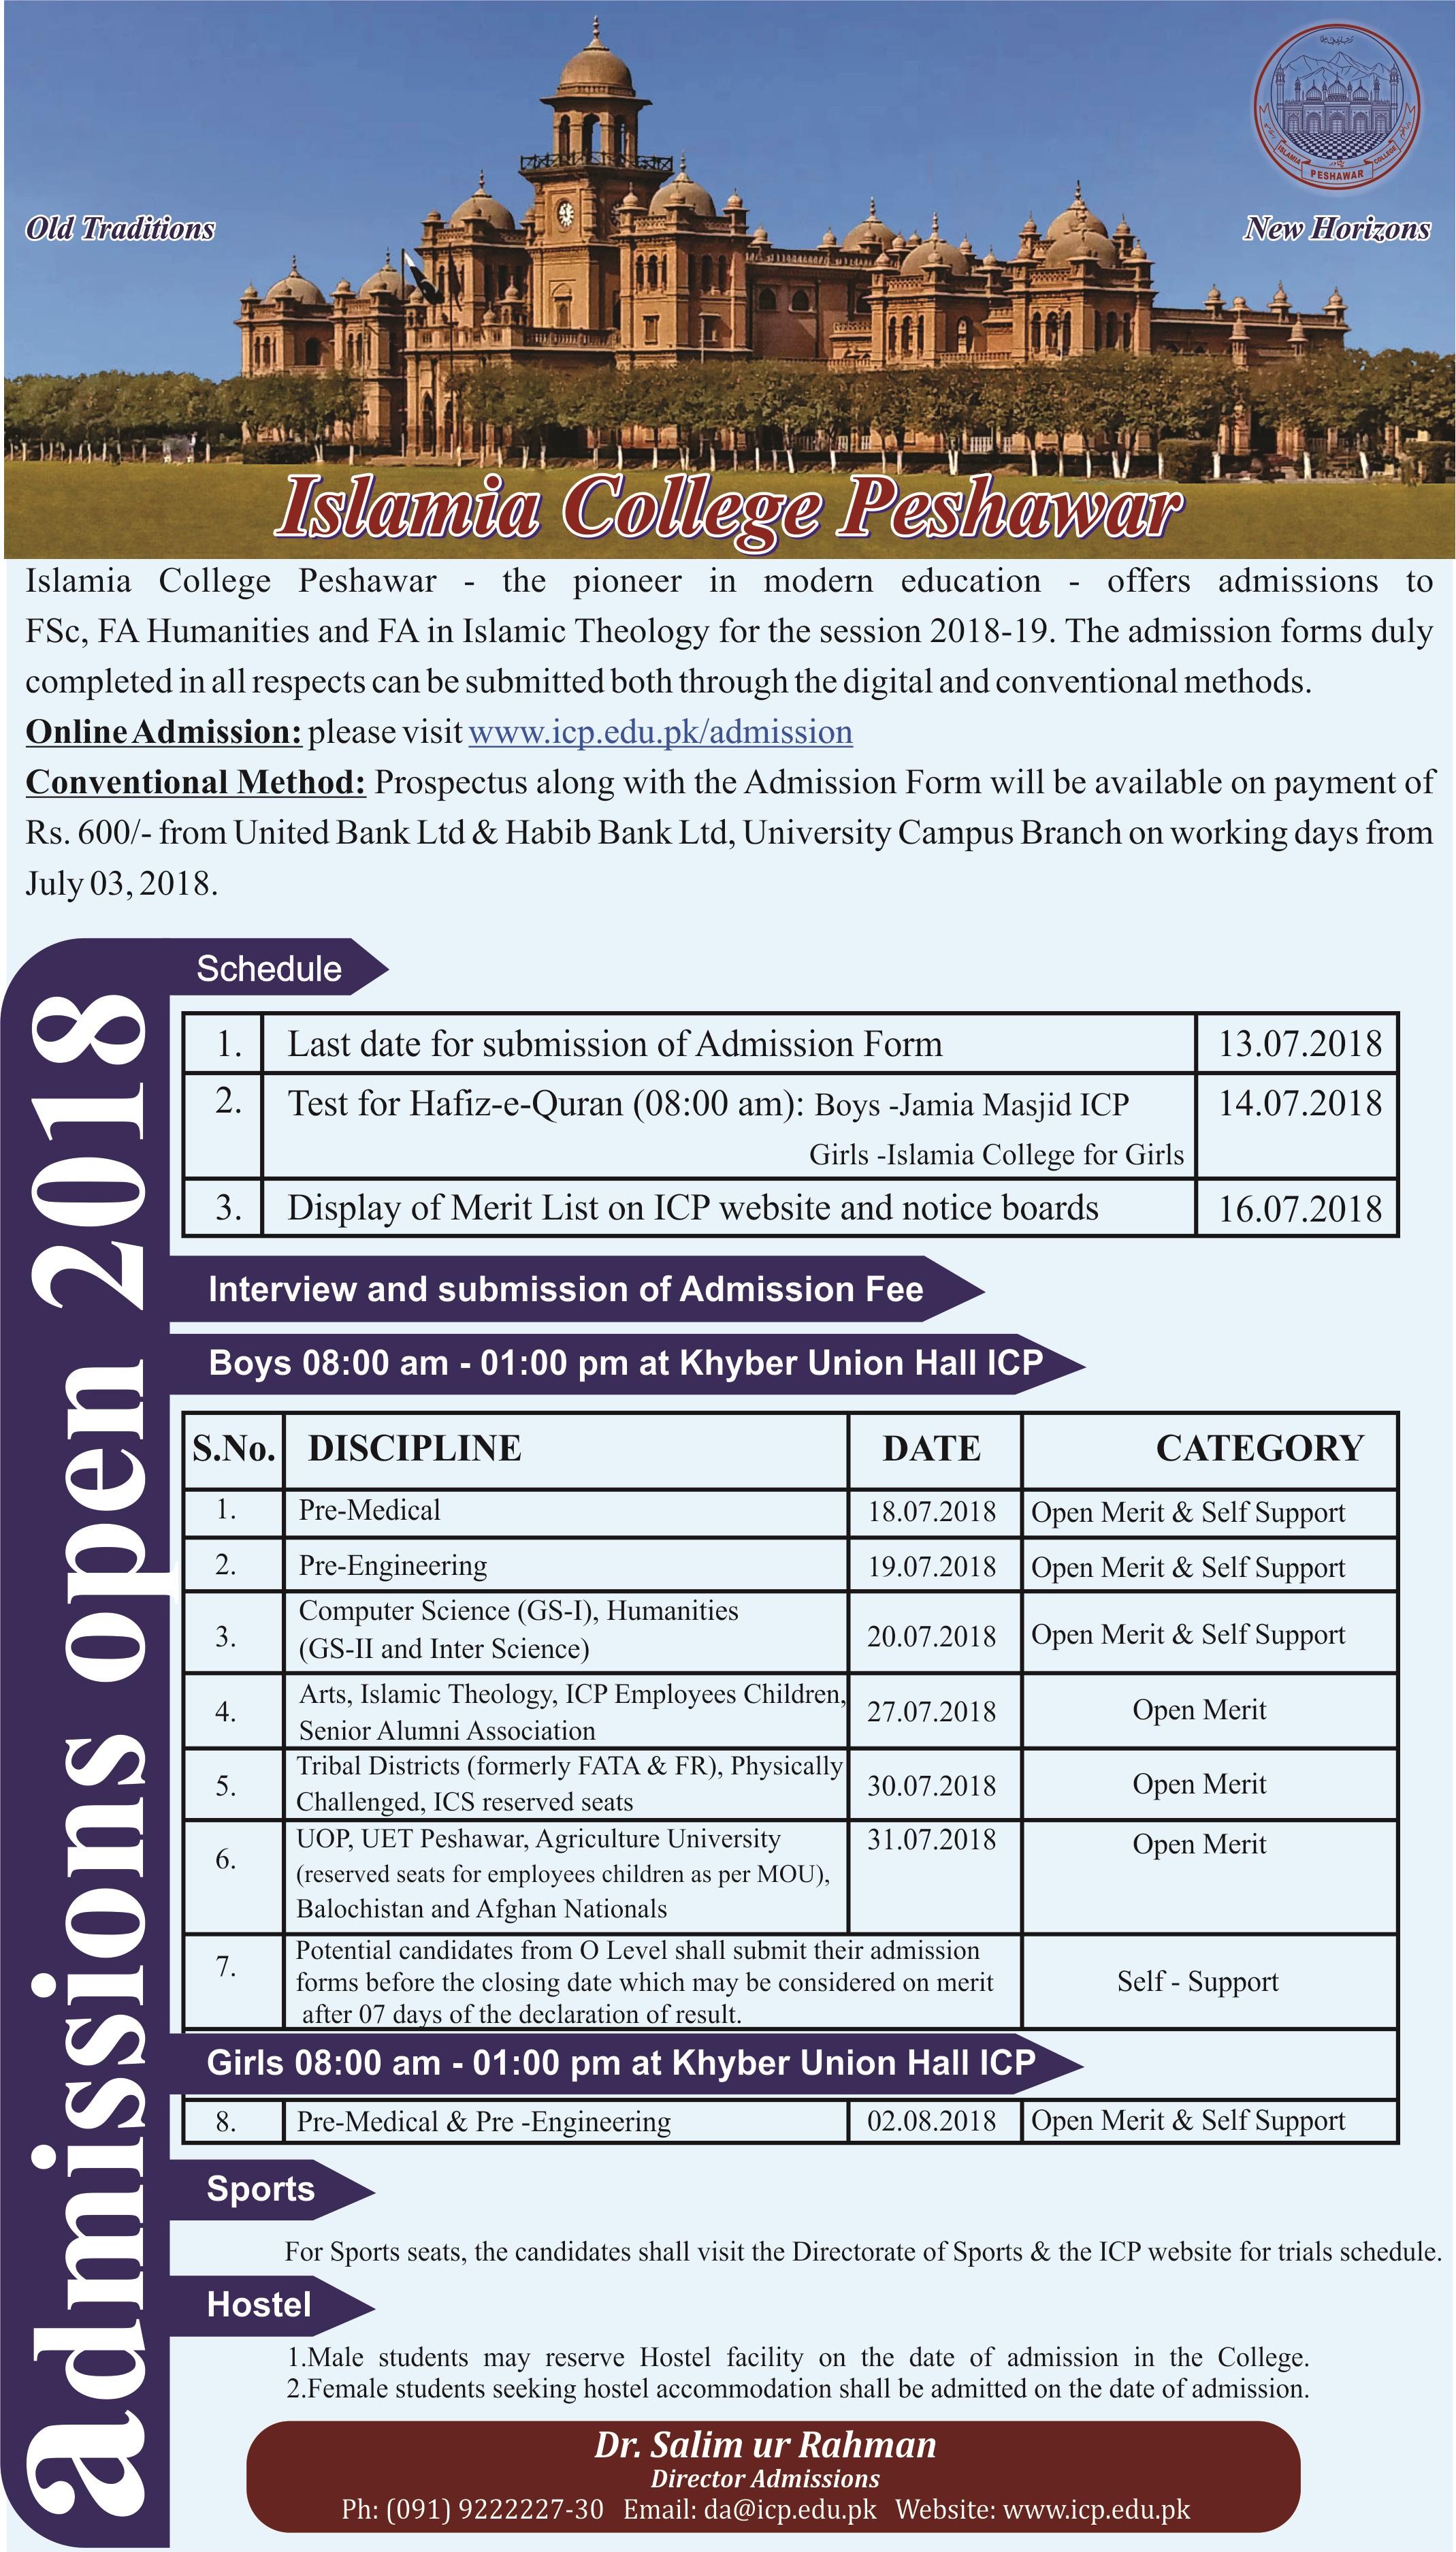 Islamia College Peshawar Admission 2018 Form, Merit list